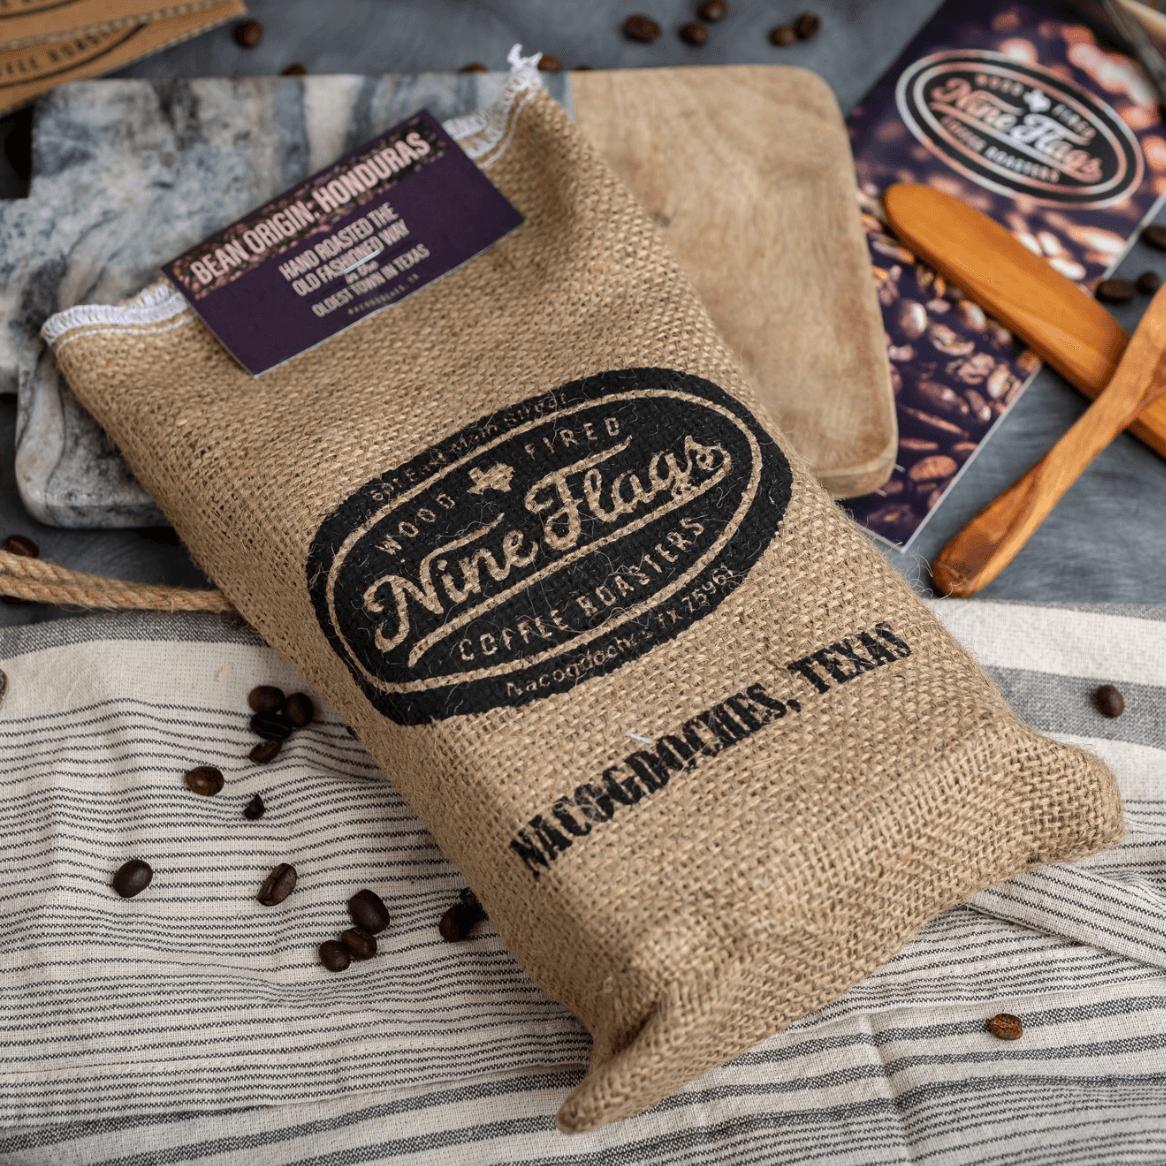 Honduras Micro Lot from Nine Flags Coffee Roasters